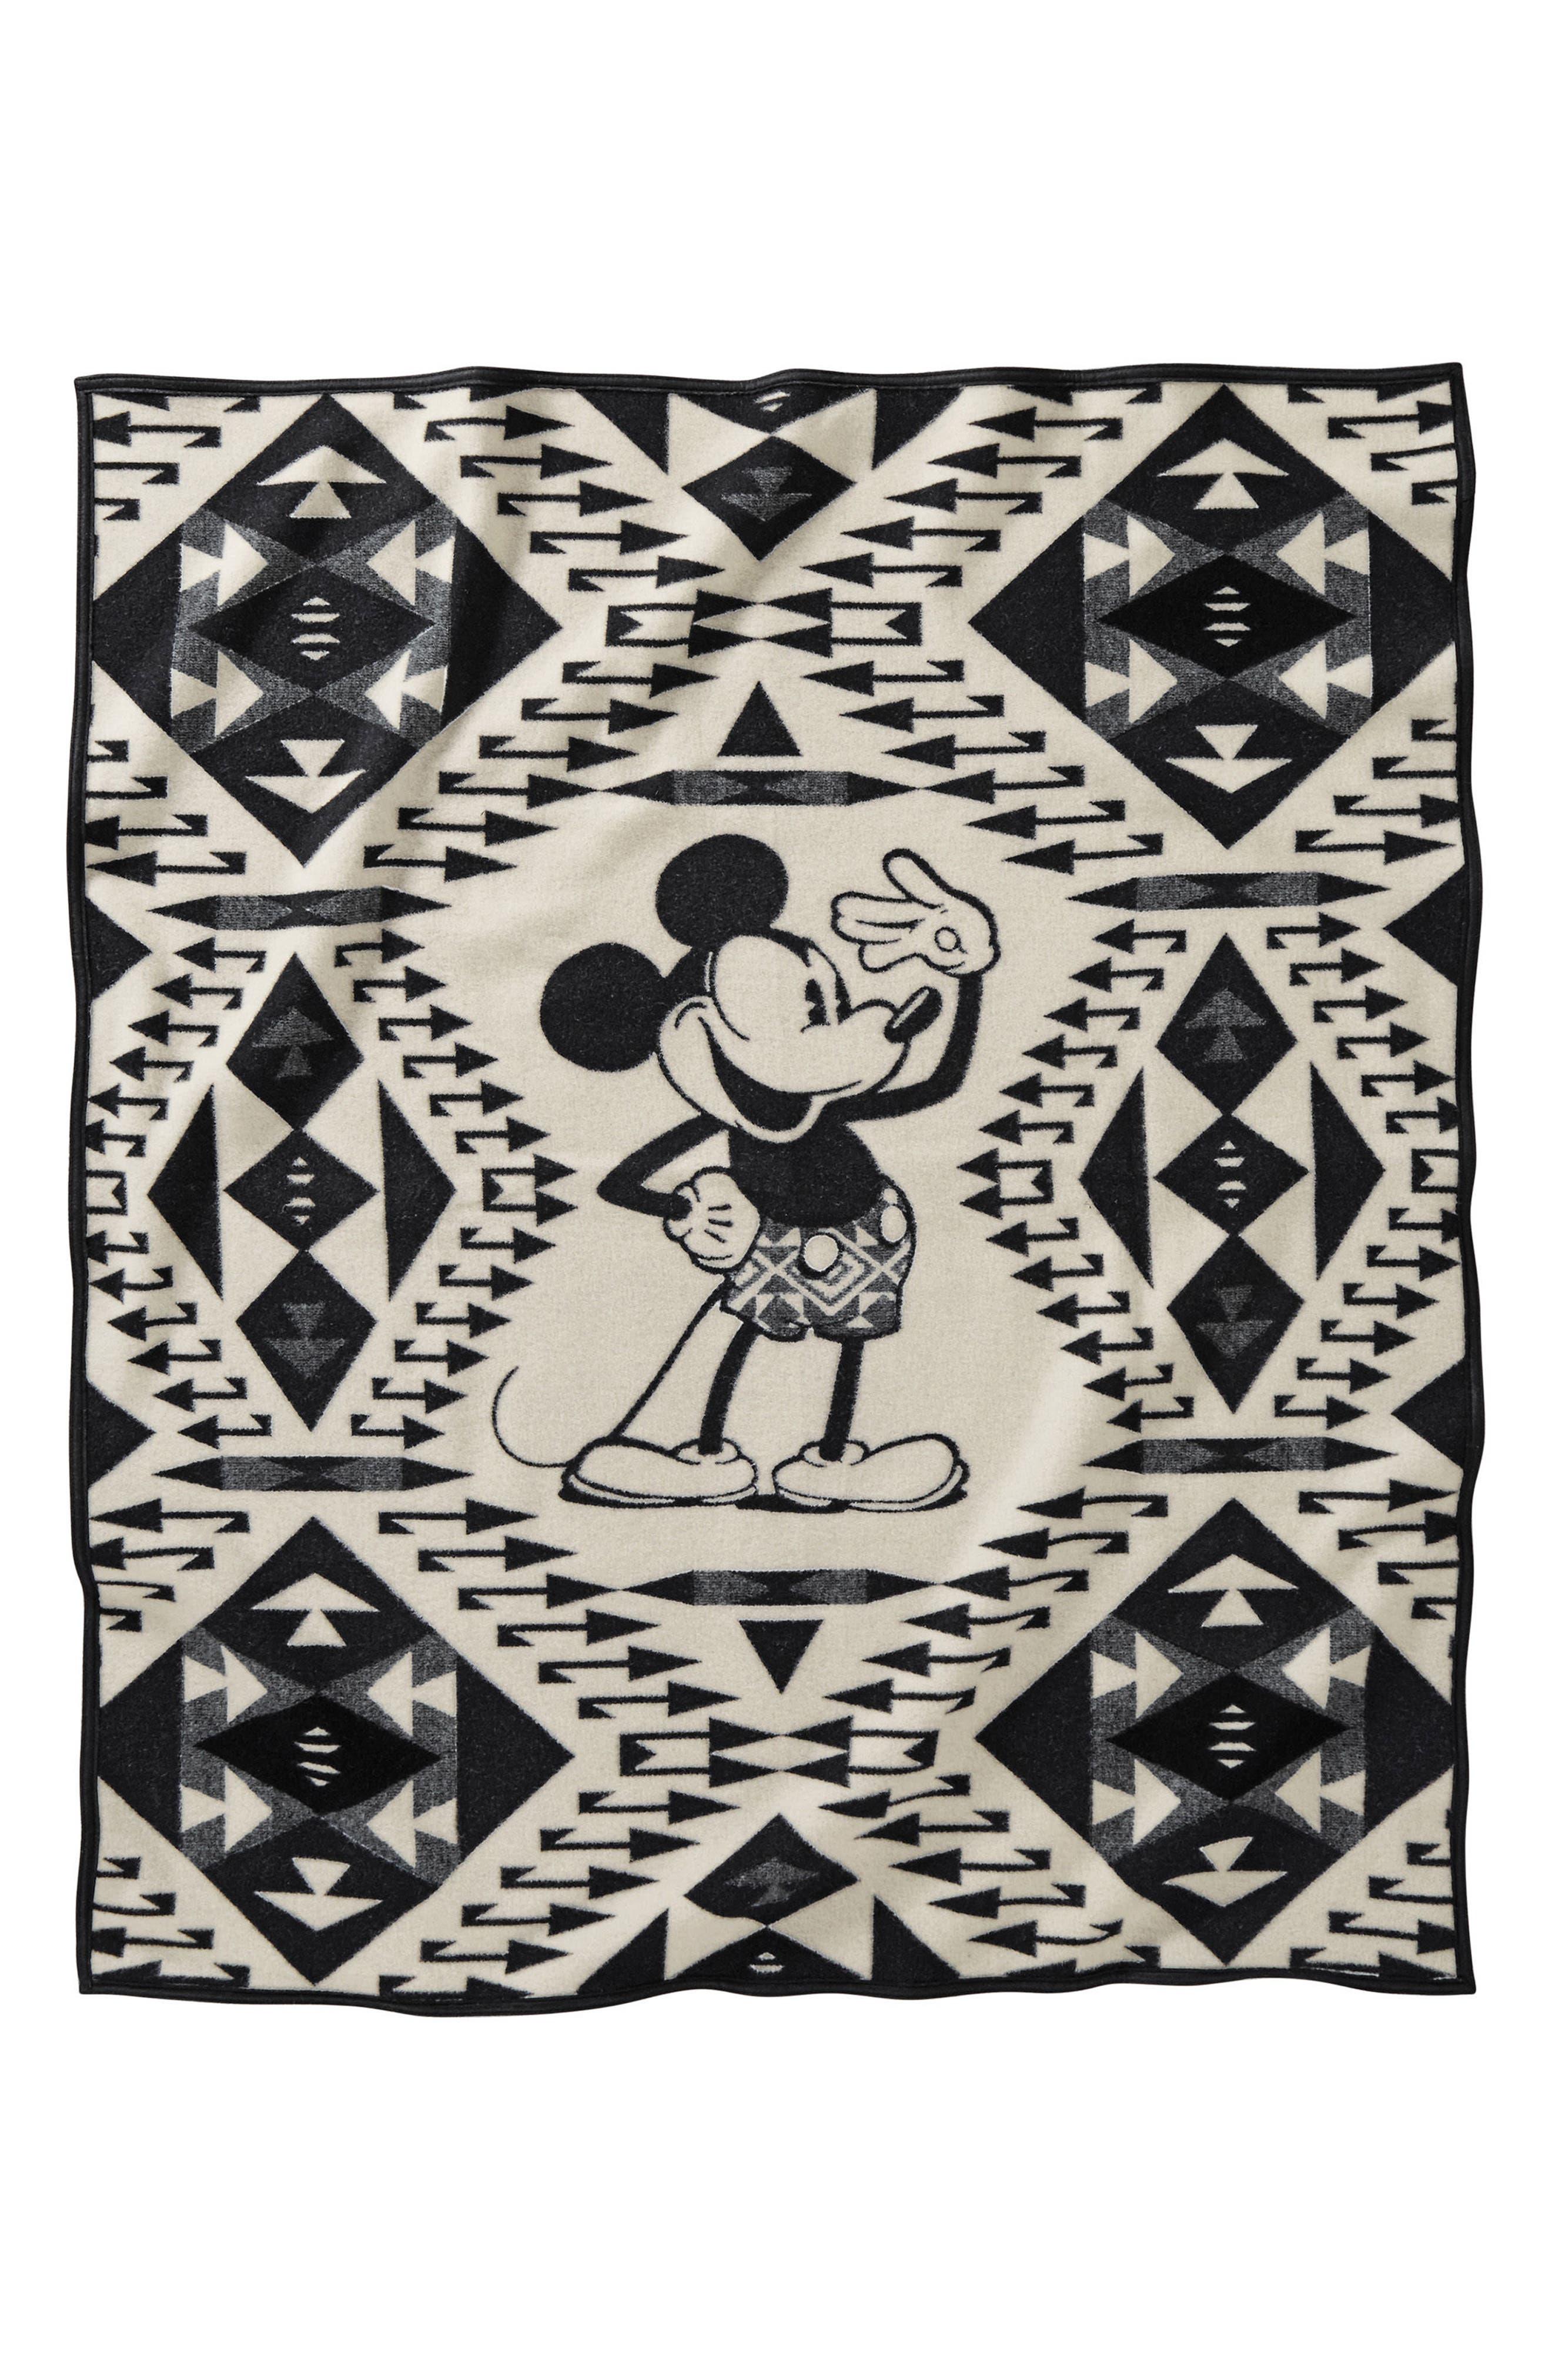 Mickey's Salute Blanket Throw,                             Main thumbnail 1, color,                             Black/ White